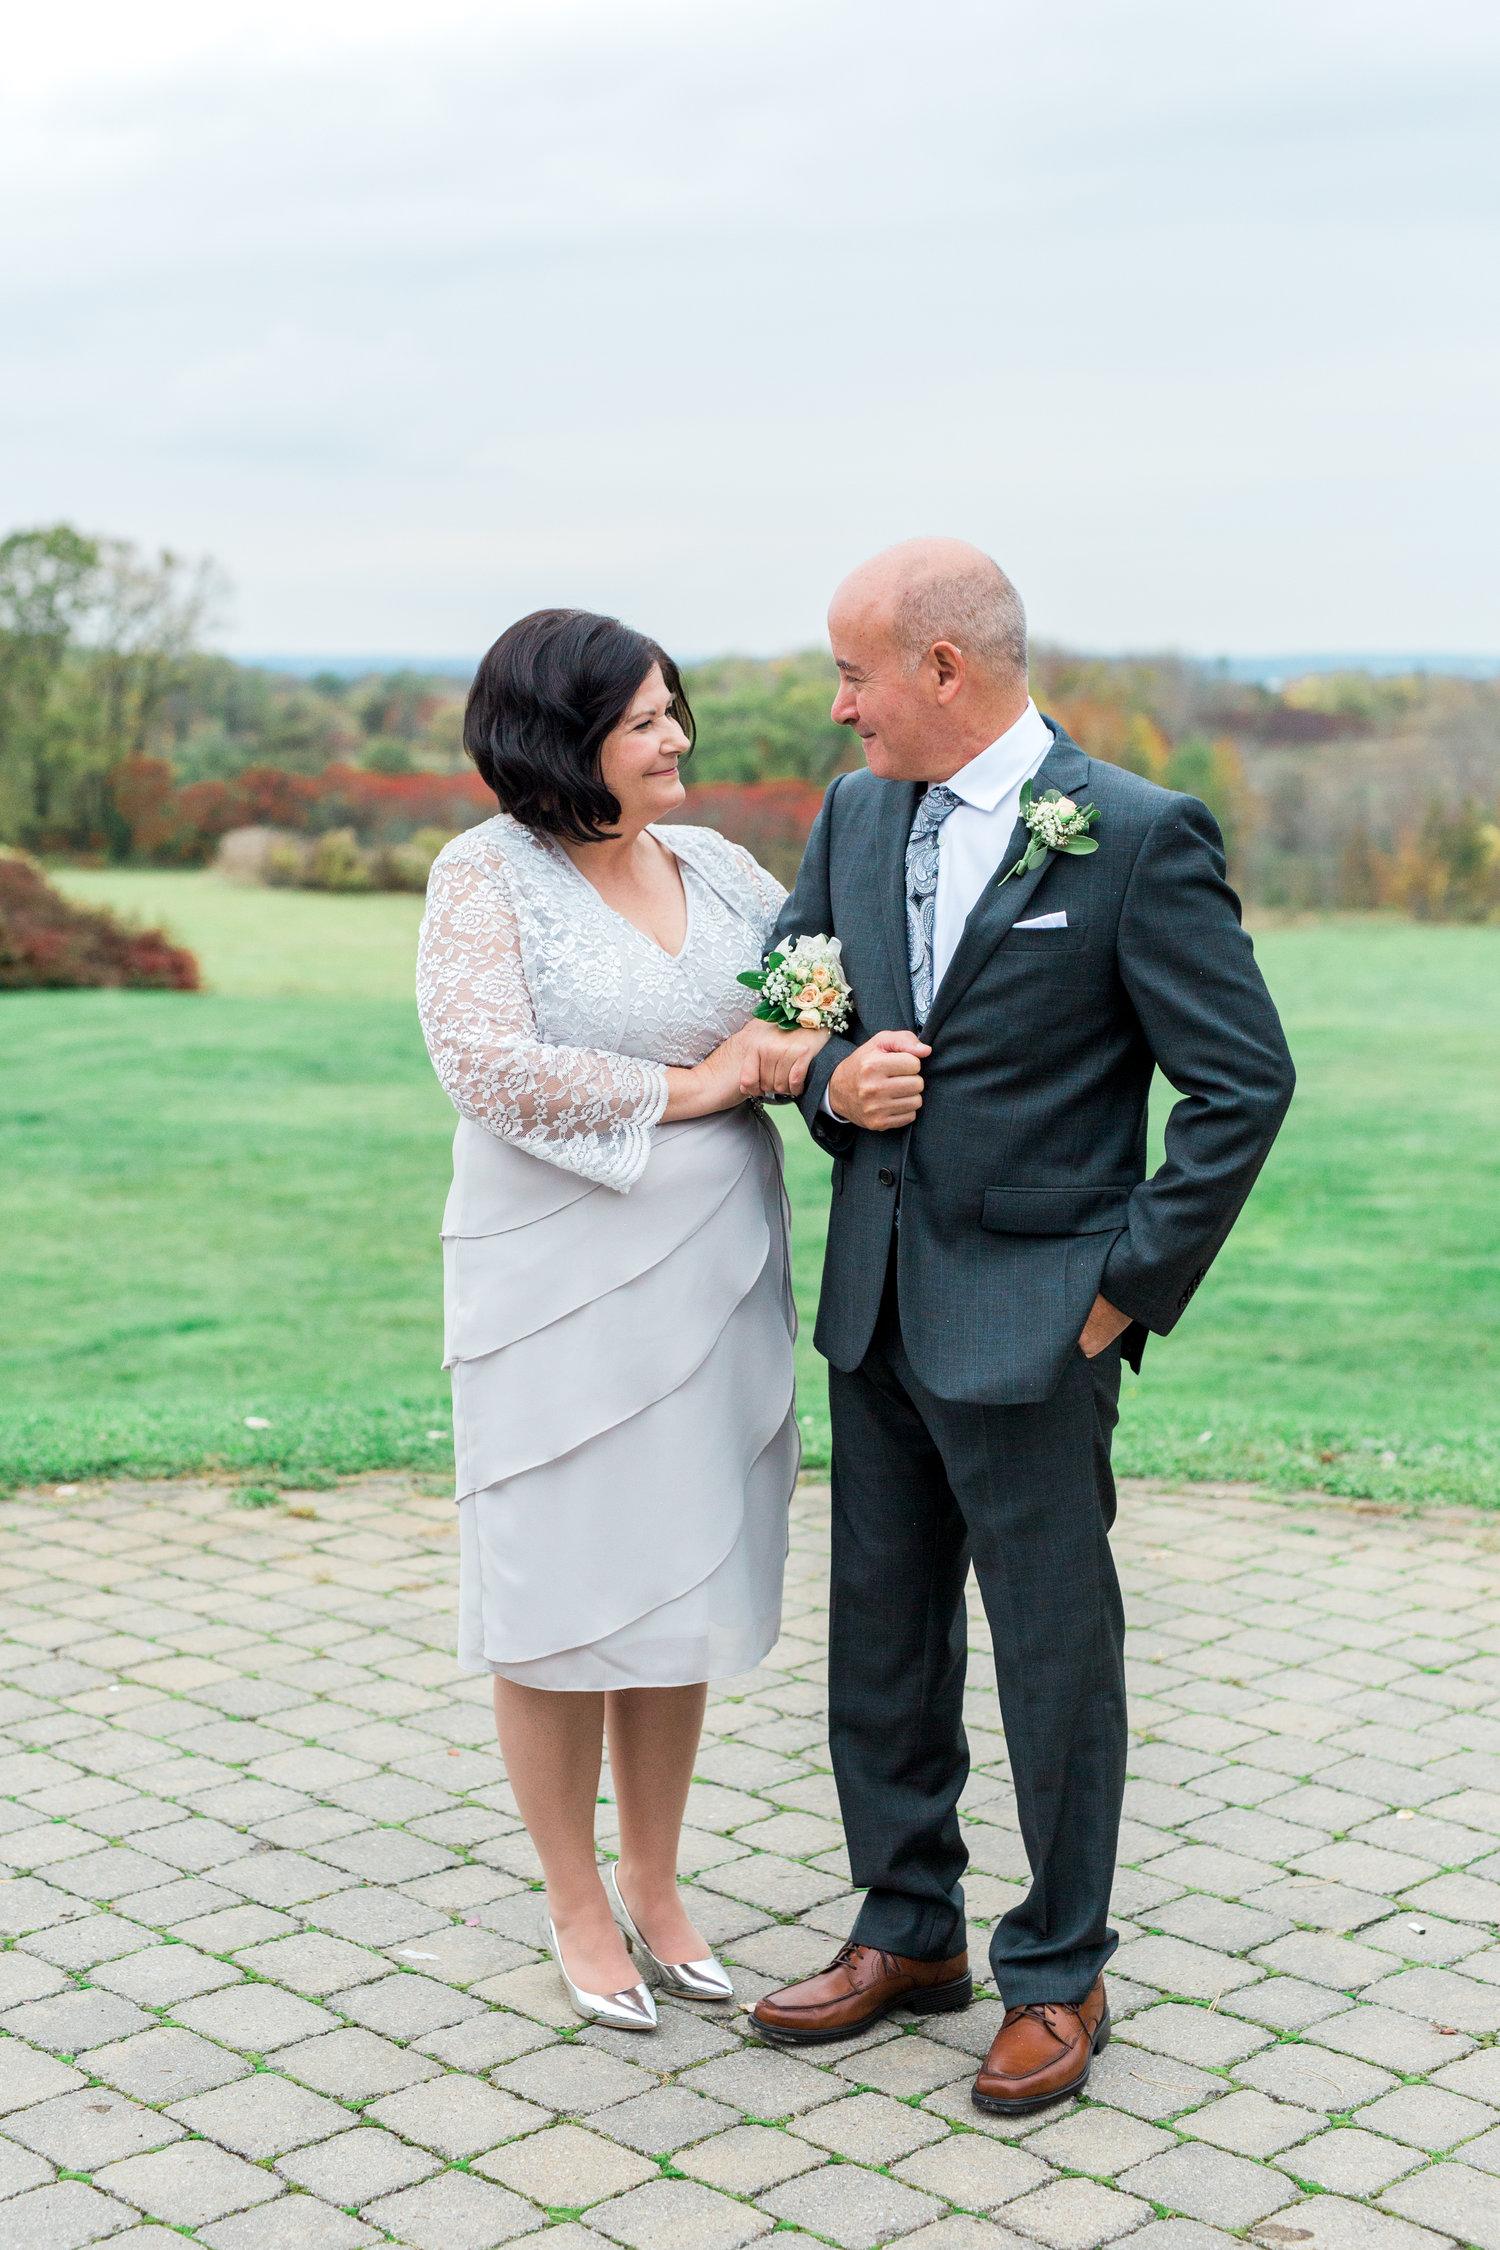 Amir-Golbazi-Danielle-Giroux-Photography_Toronto-Wedding_Cedarwood_Rachel-Paul_365.jpg